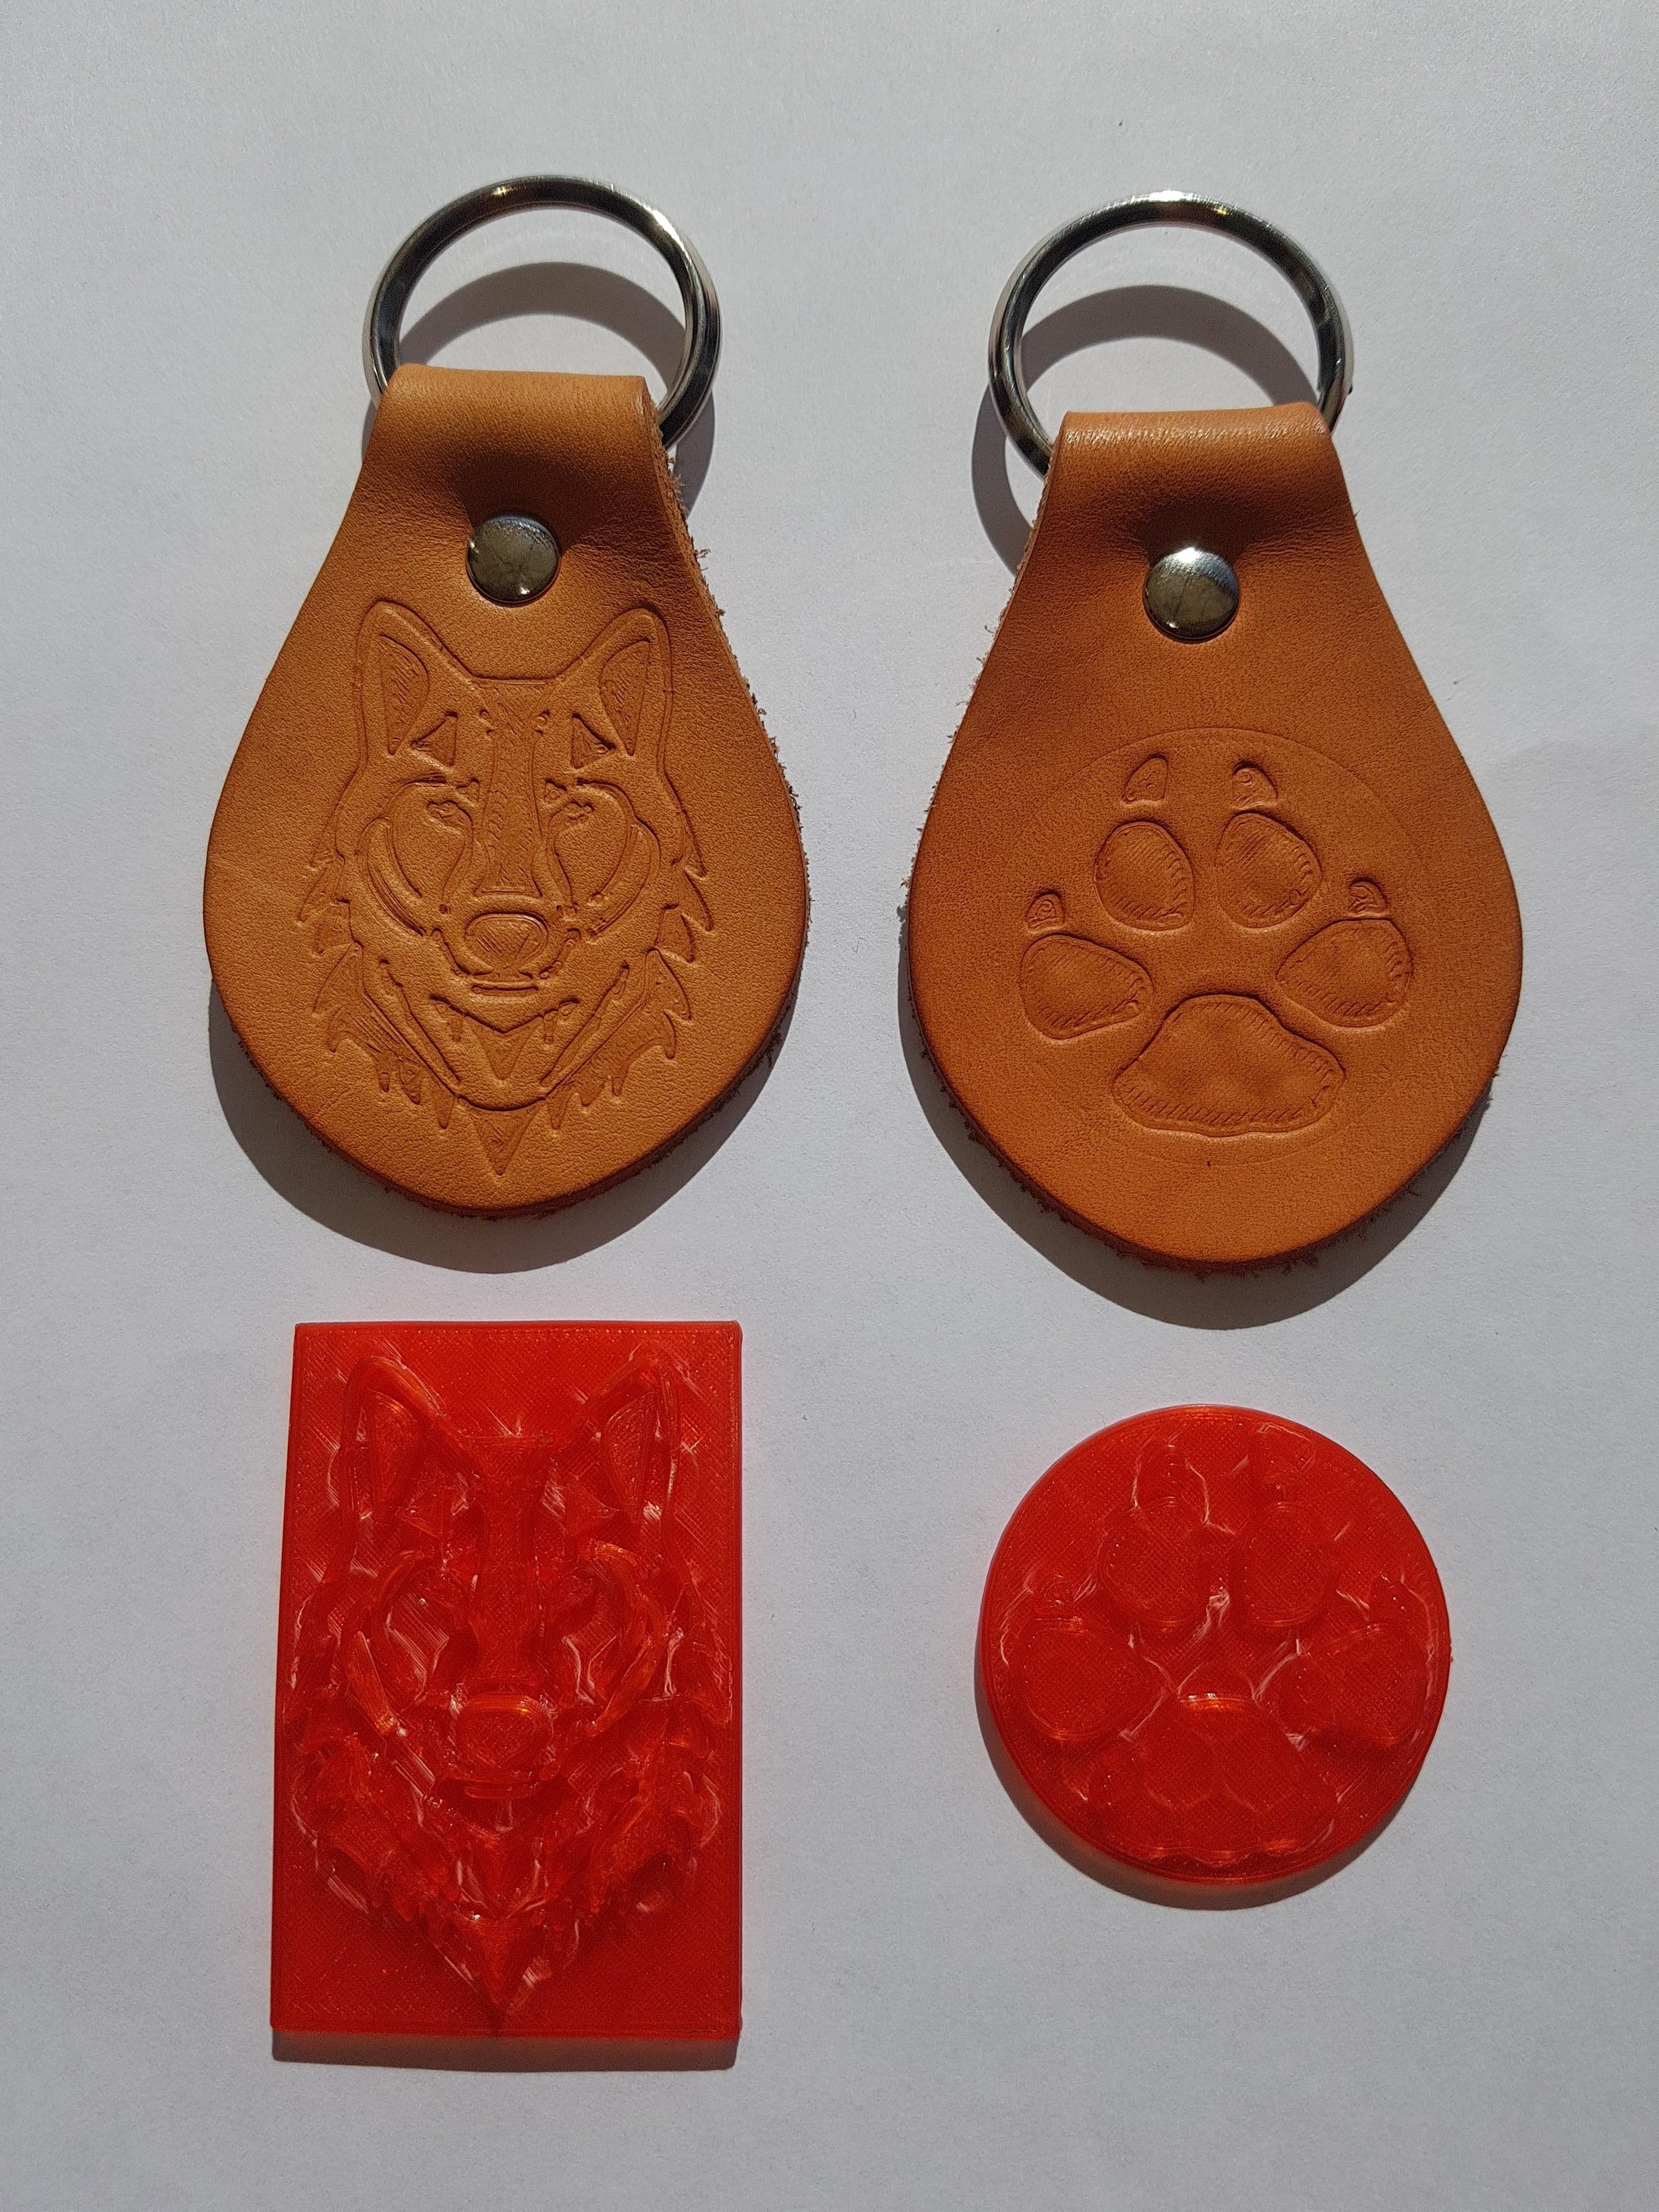 20190330_112336.jpg Download STL file  Wolf Leather Stamp • 3D print template, WJDesign